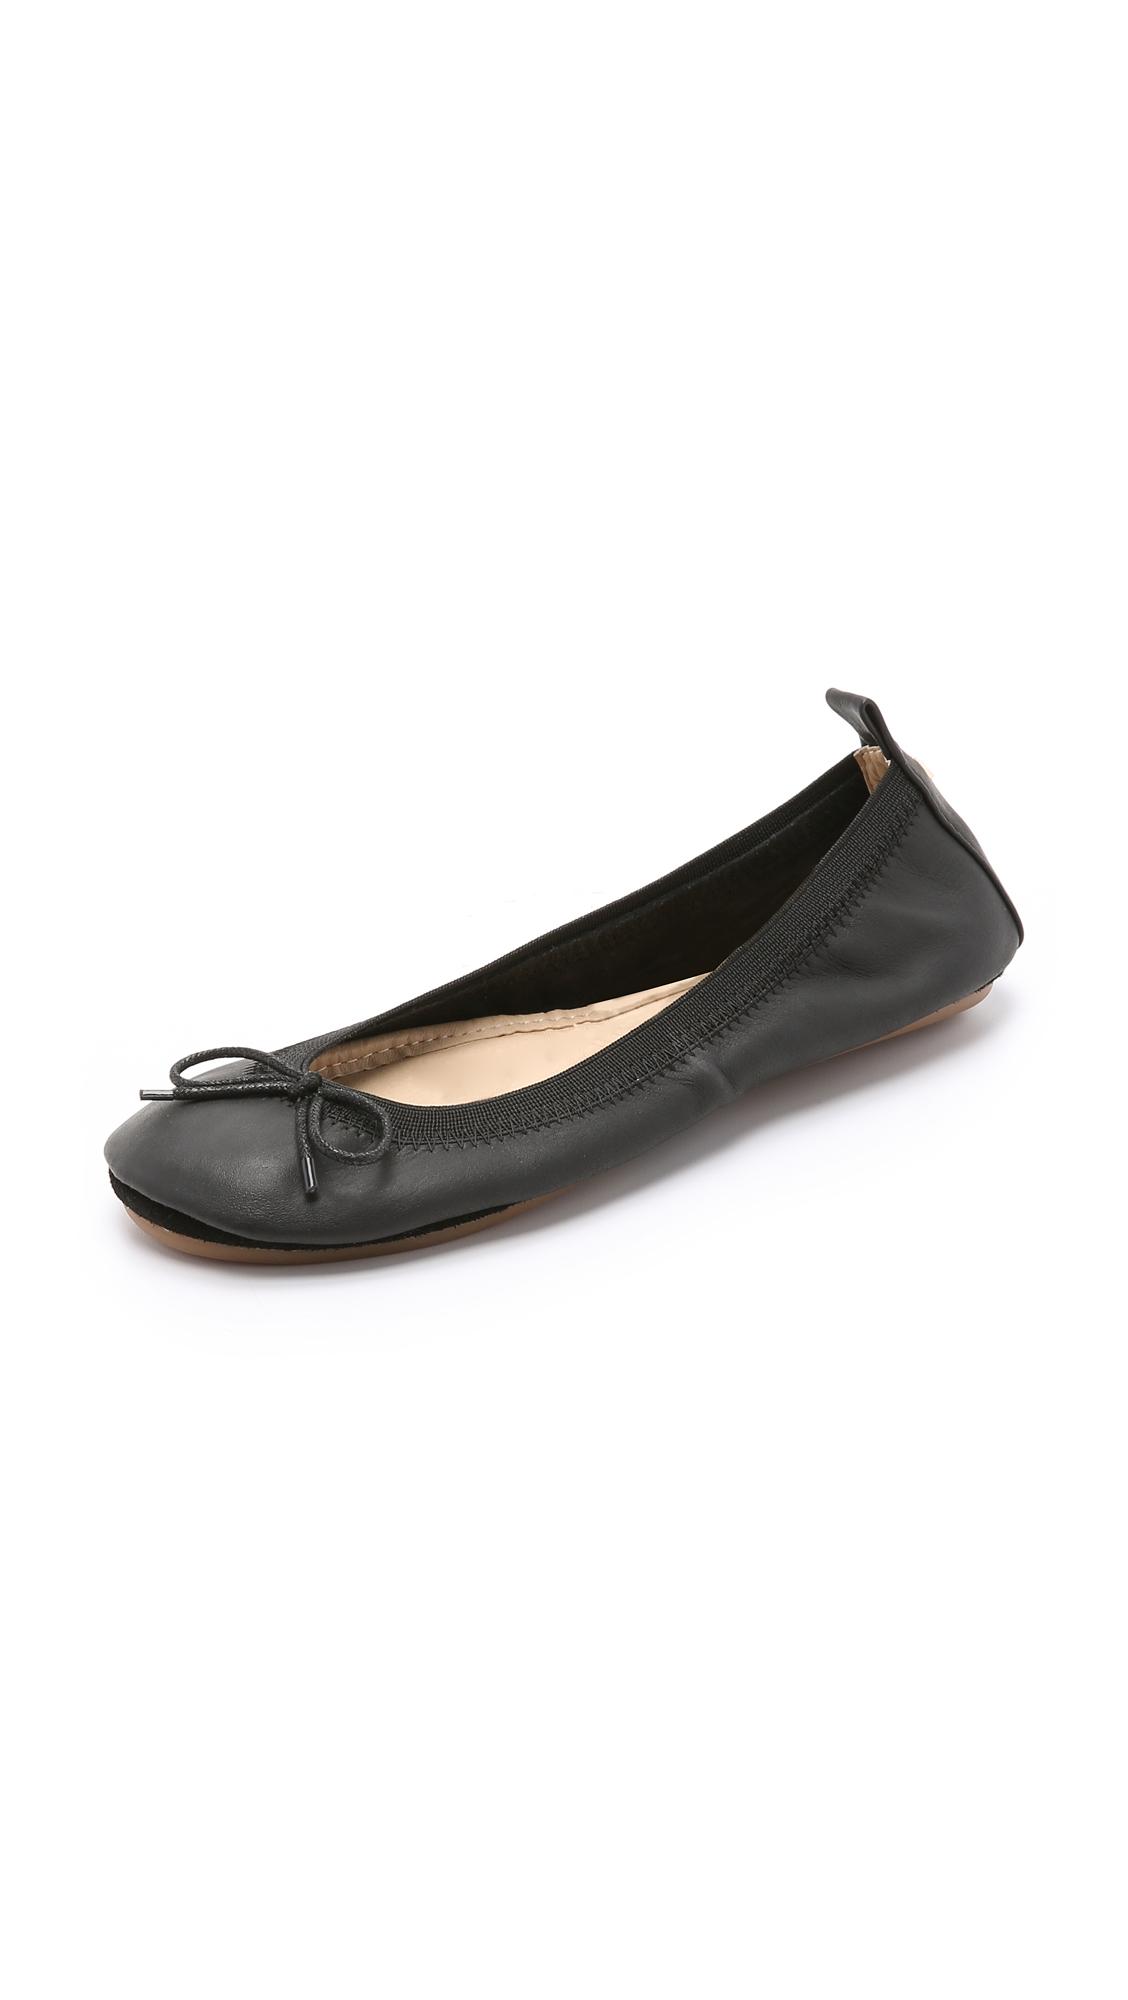 Yosi Samra Women S Shoes